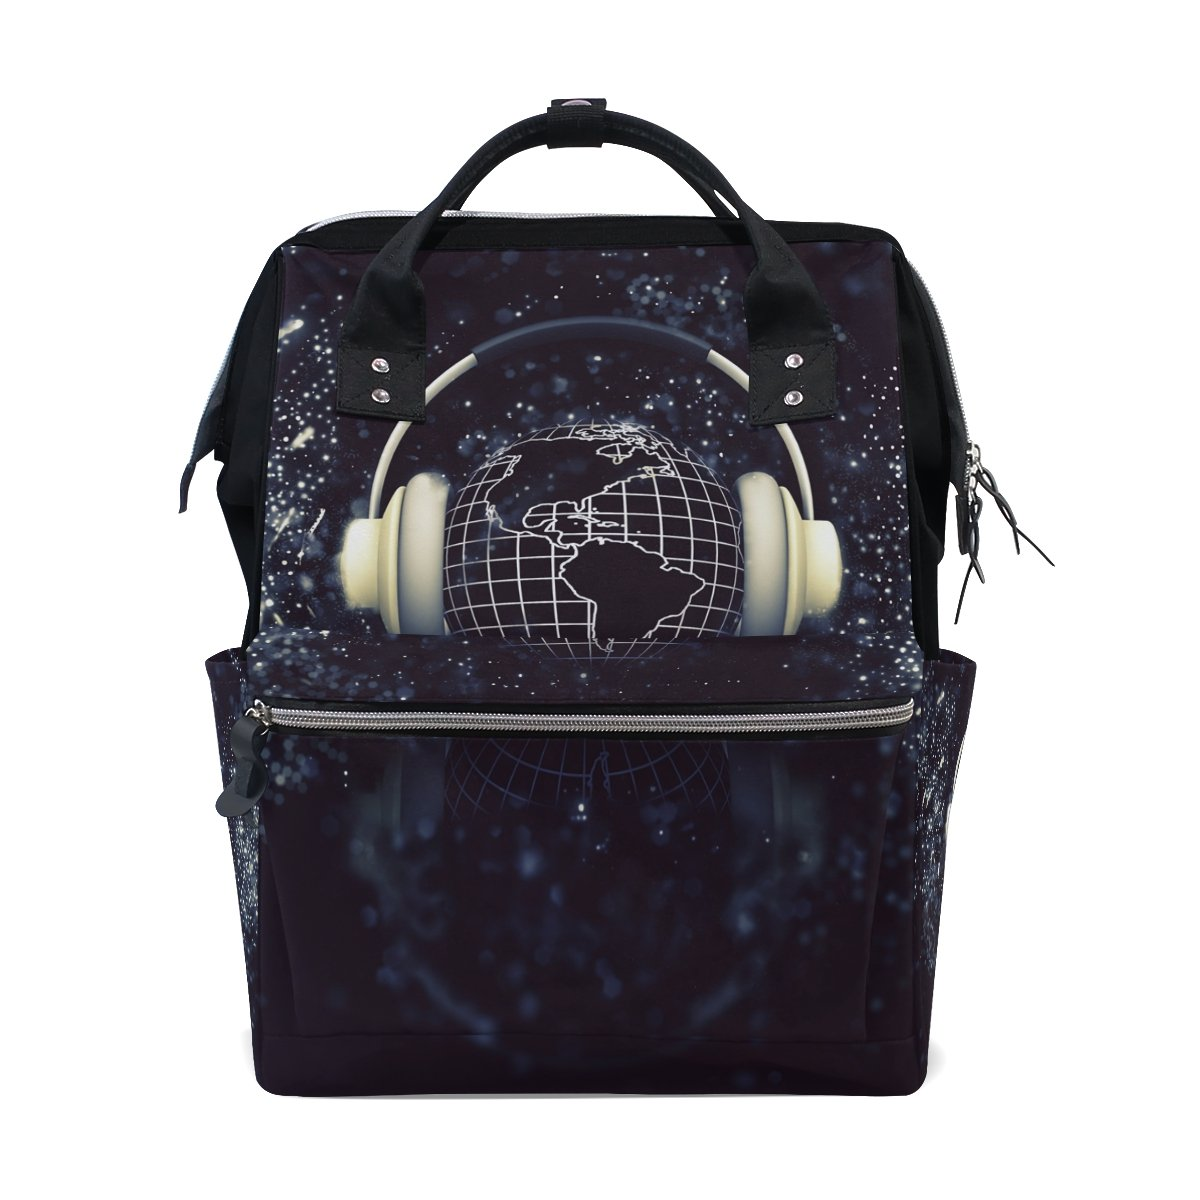 FENNEN Music Word Travel School Backpack Casual College Lightweight Laptop Backpack Large Capacity Shoulder Diaper Bag for Women Men